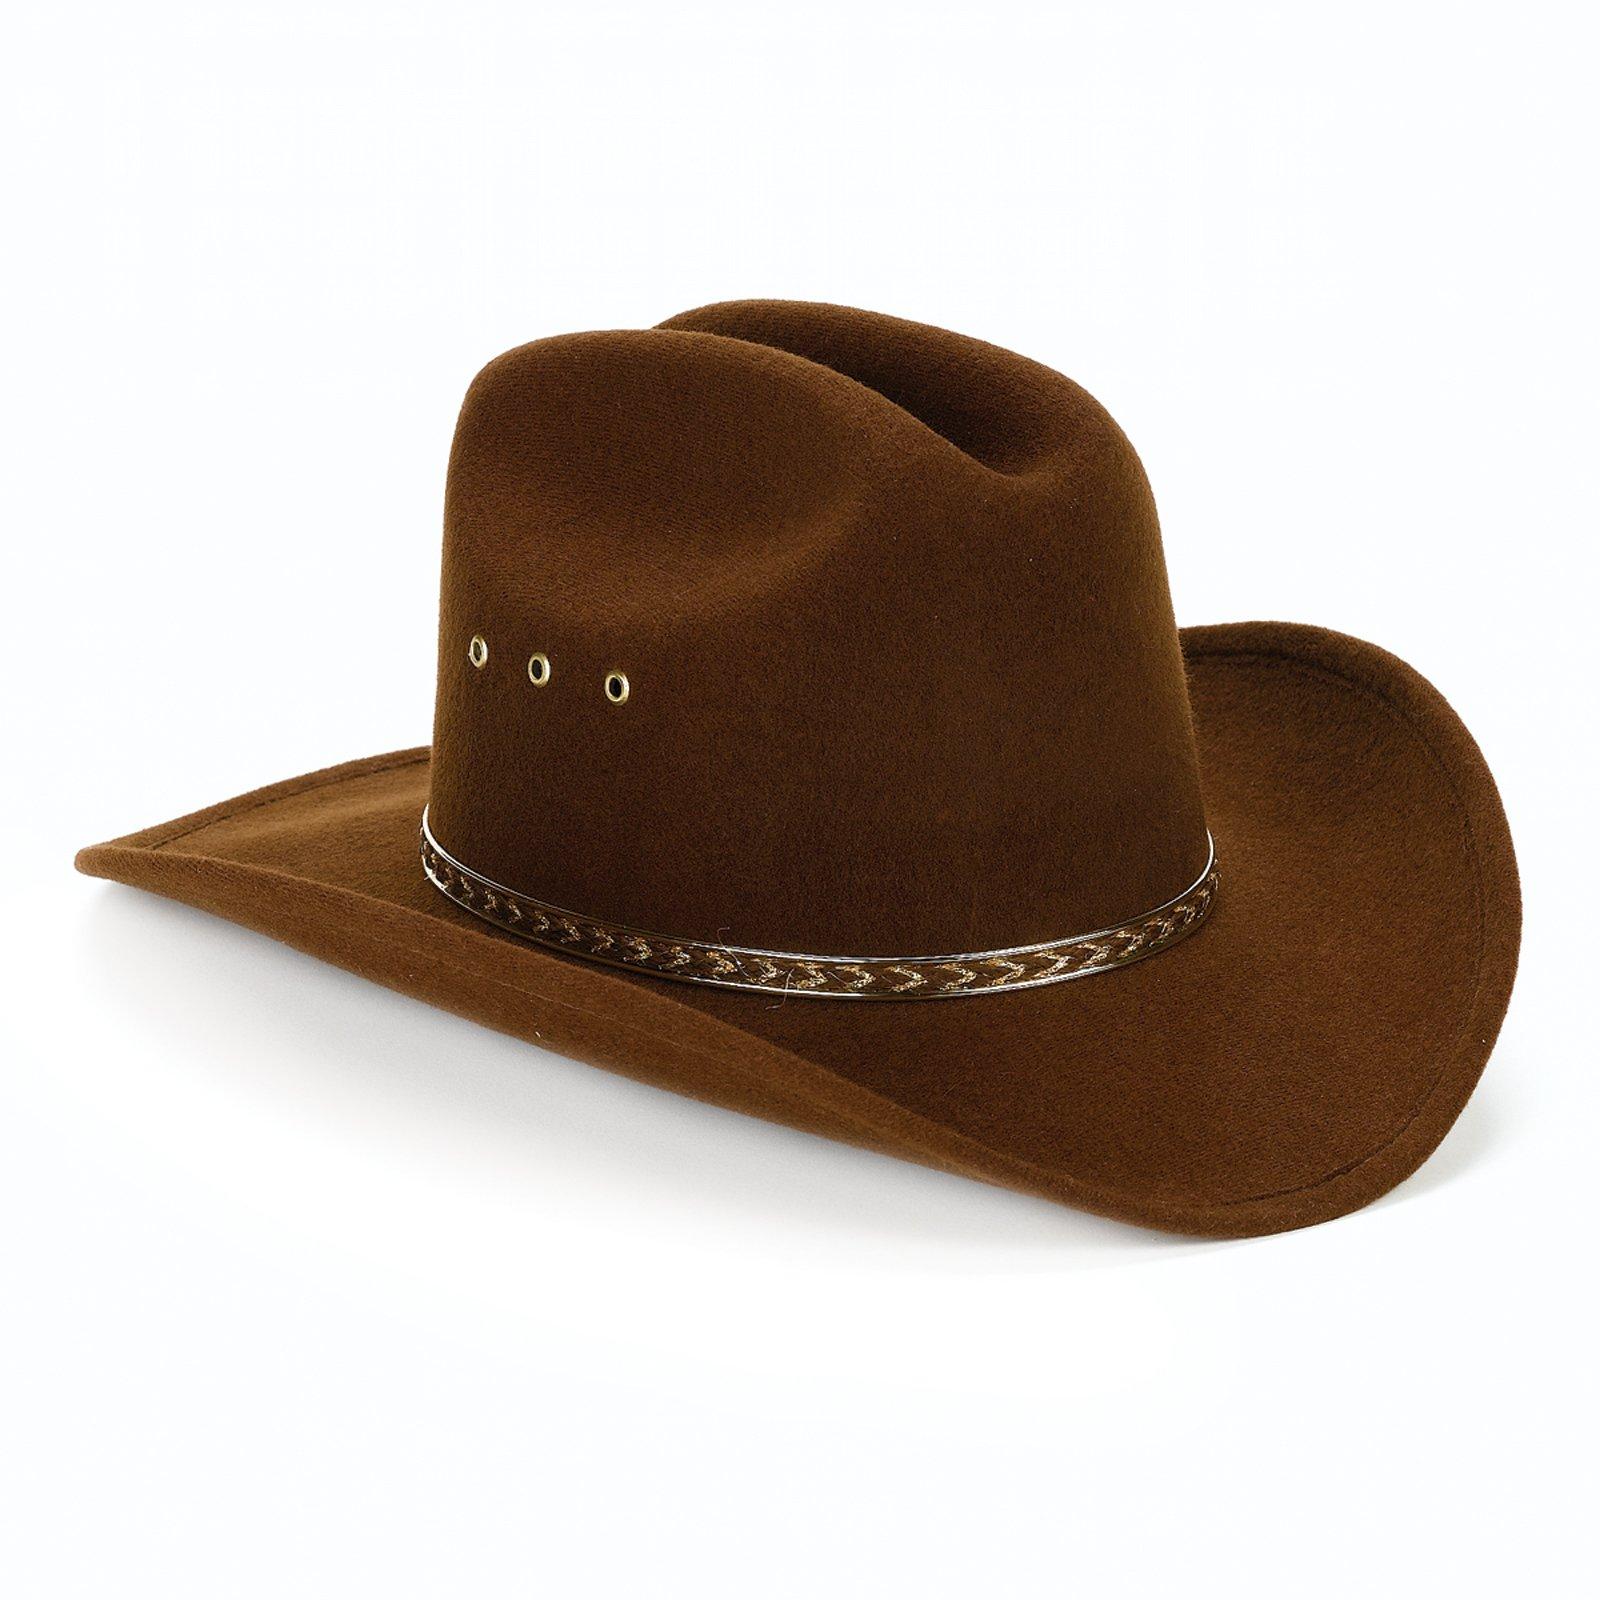 Cowboy Hat Funky Hats Wiki Fandom Powered By Wikia 6e28b49915a5